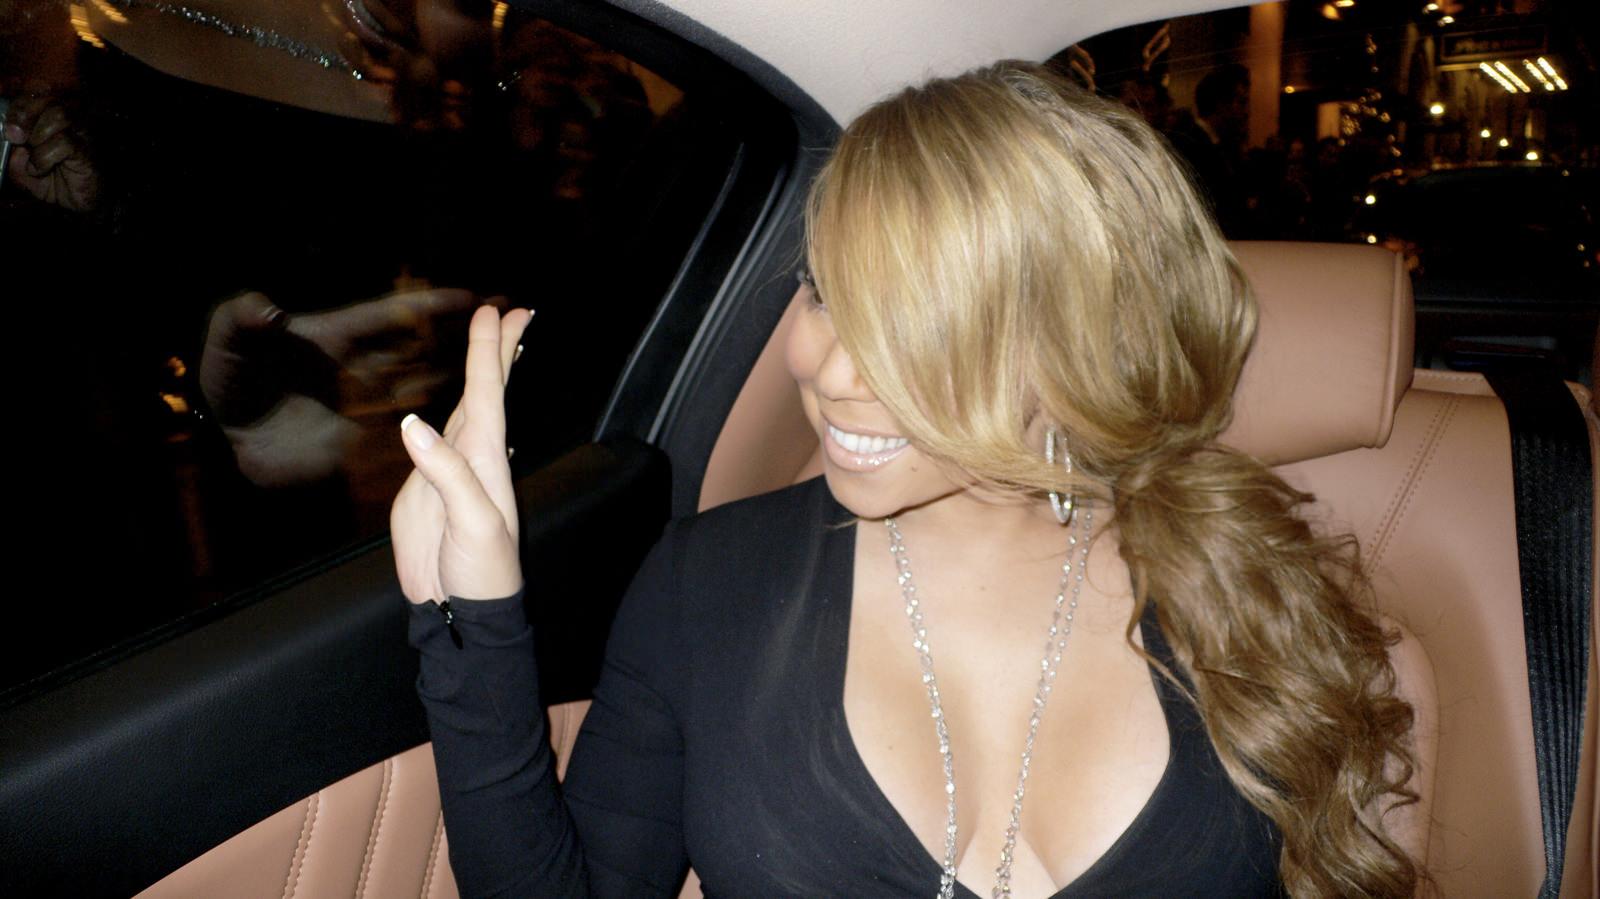 Mariah Carey Photo Gallery